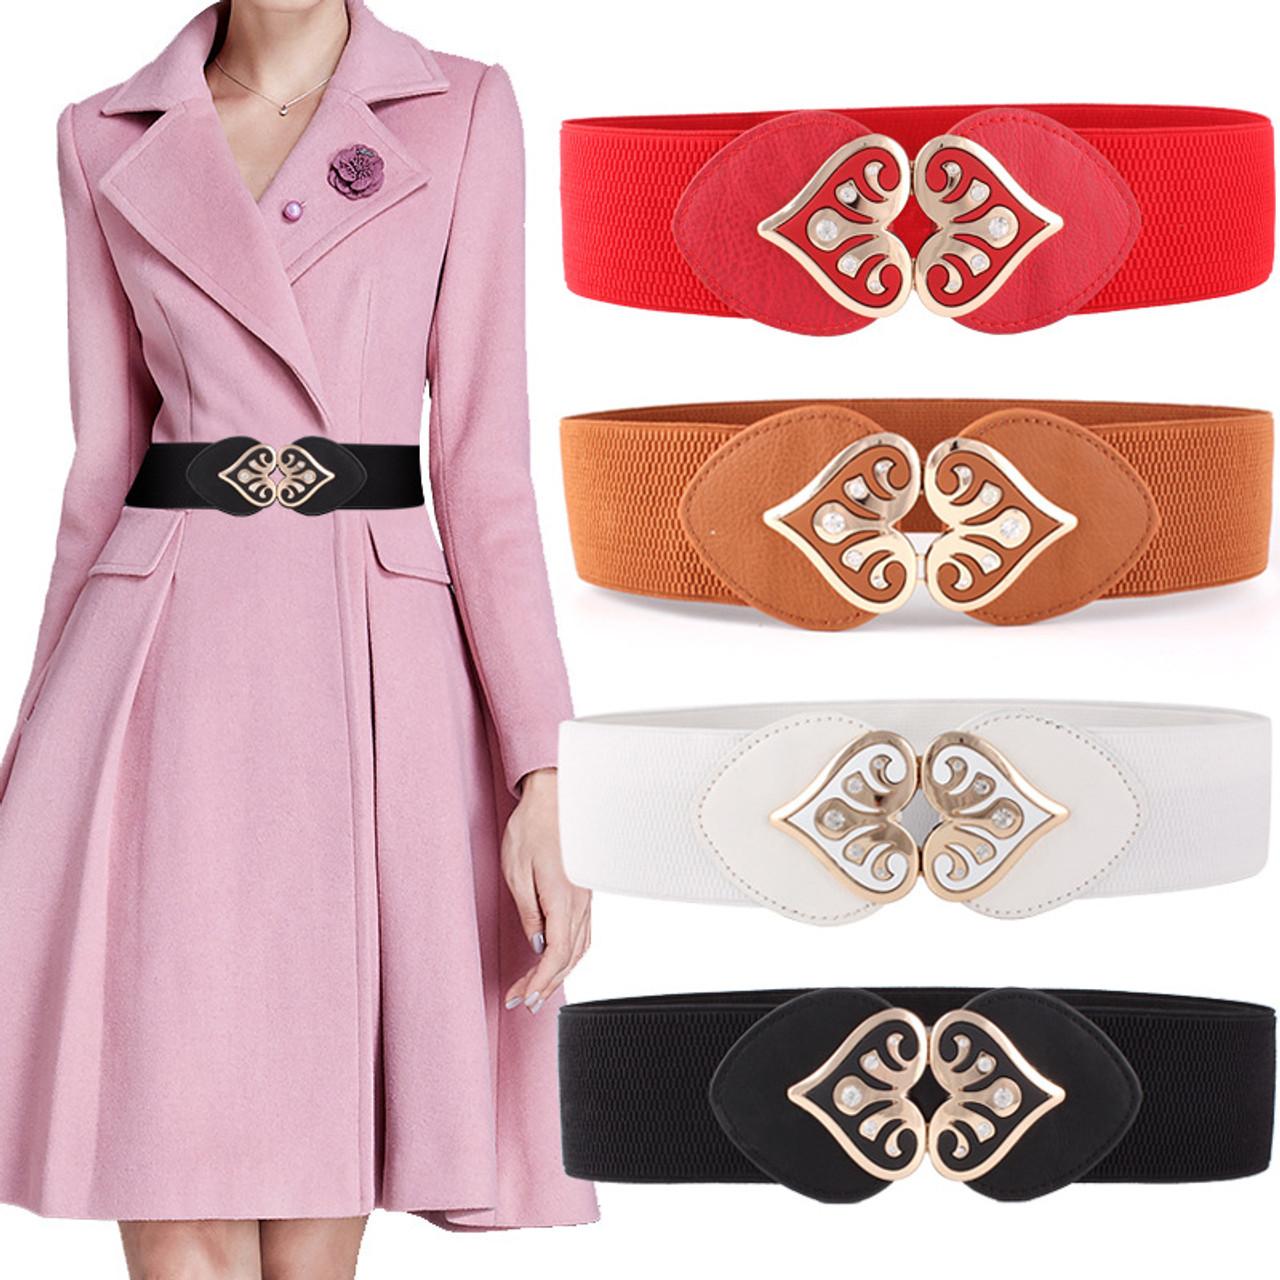 8281d433ddabf wide pu leather heart shape rhinestone designer Elastic belts for women, Elastic Tight High Waist ...